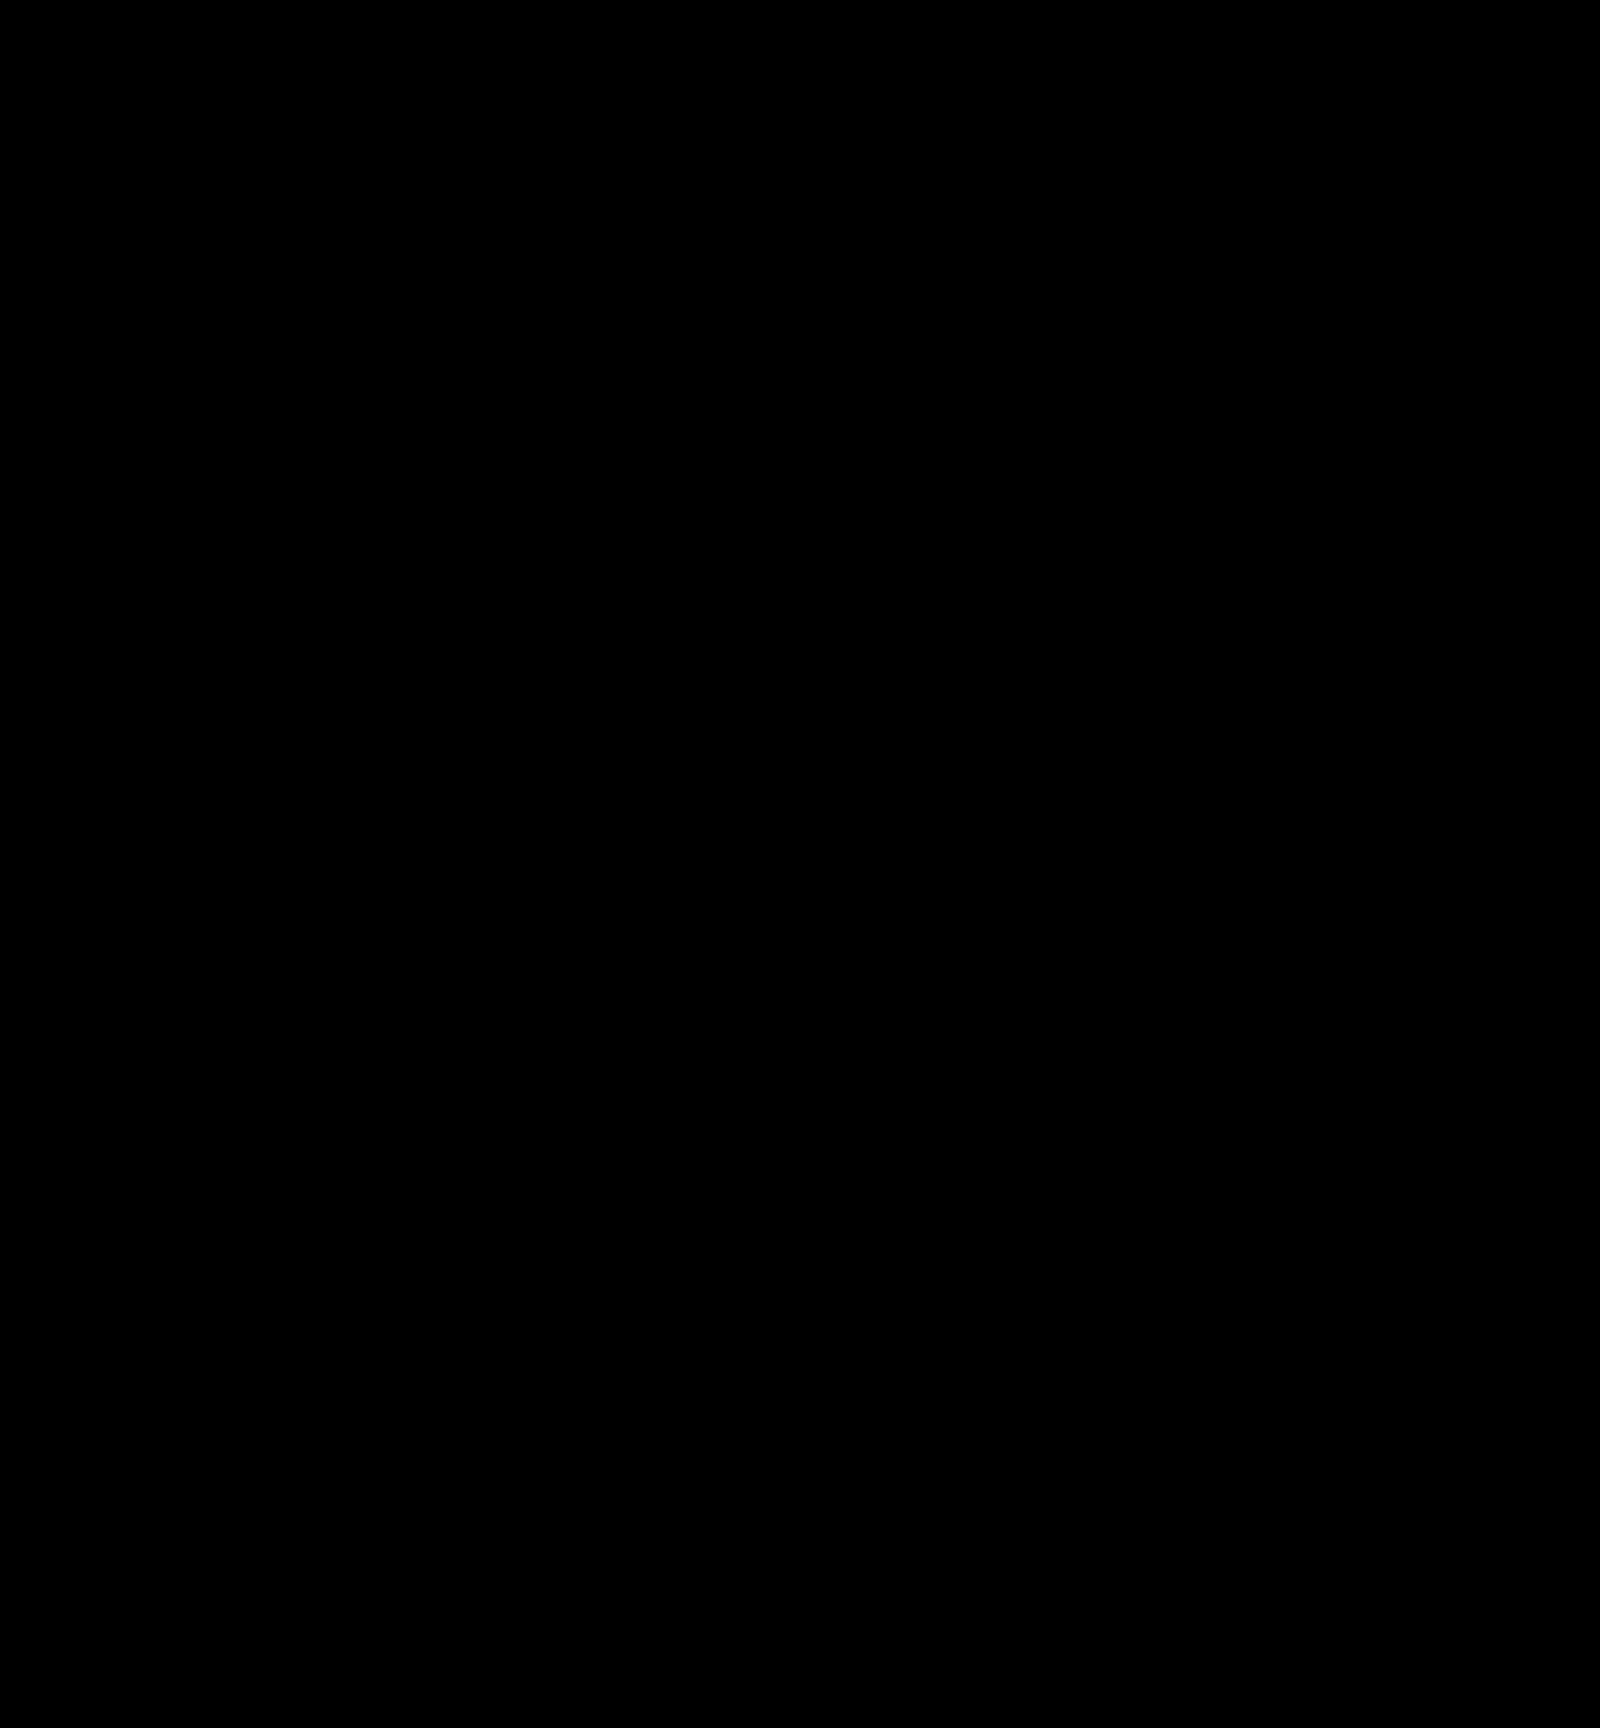 Vines SVG Clip arts